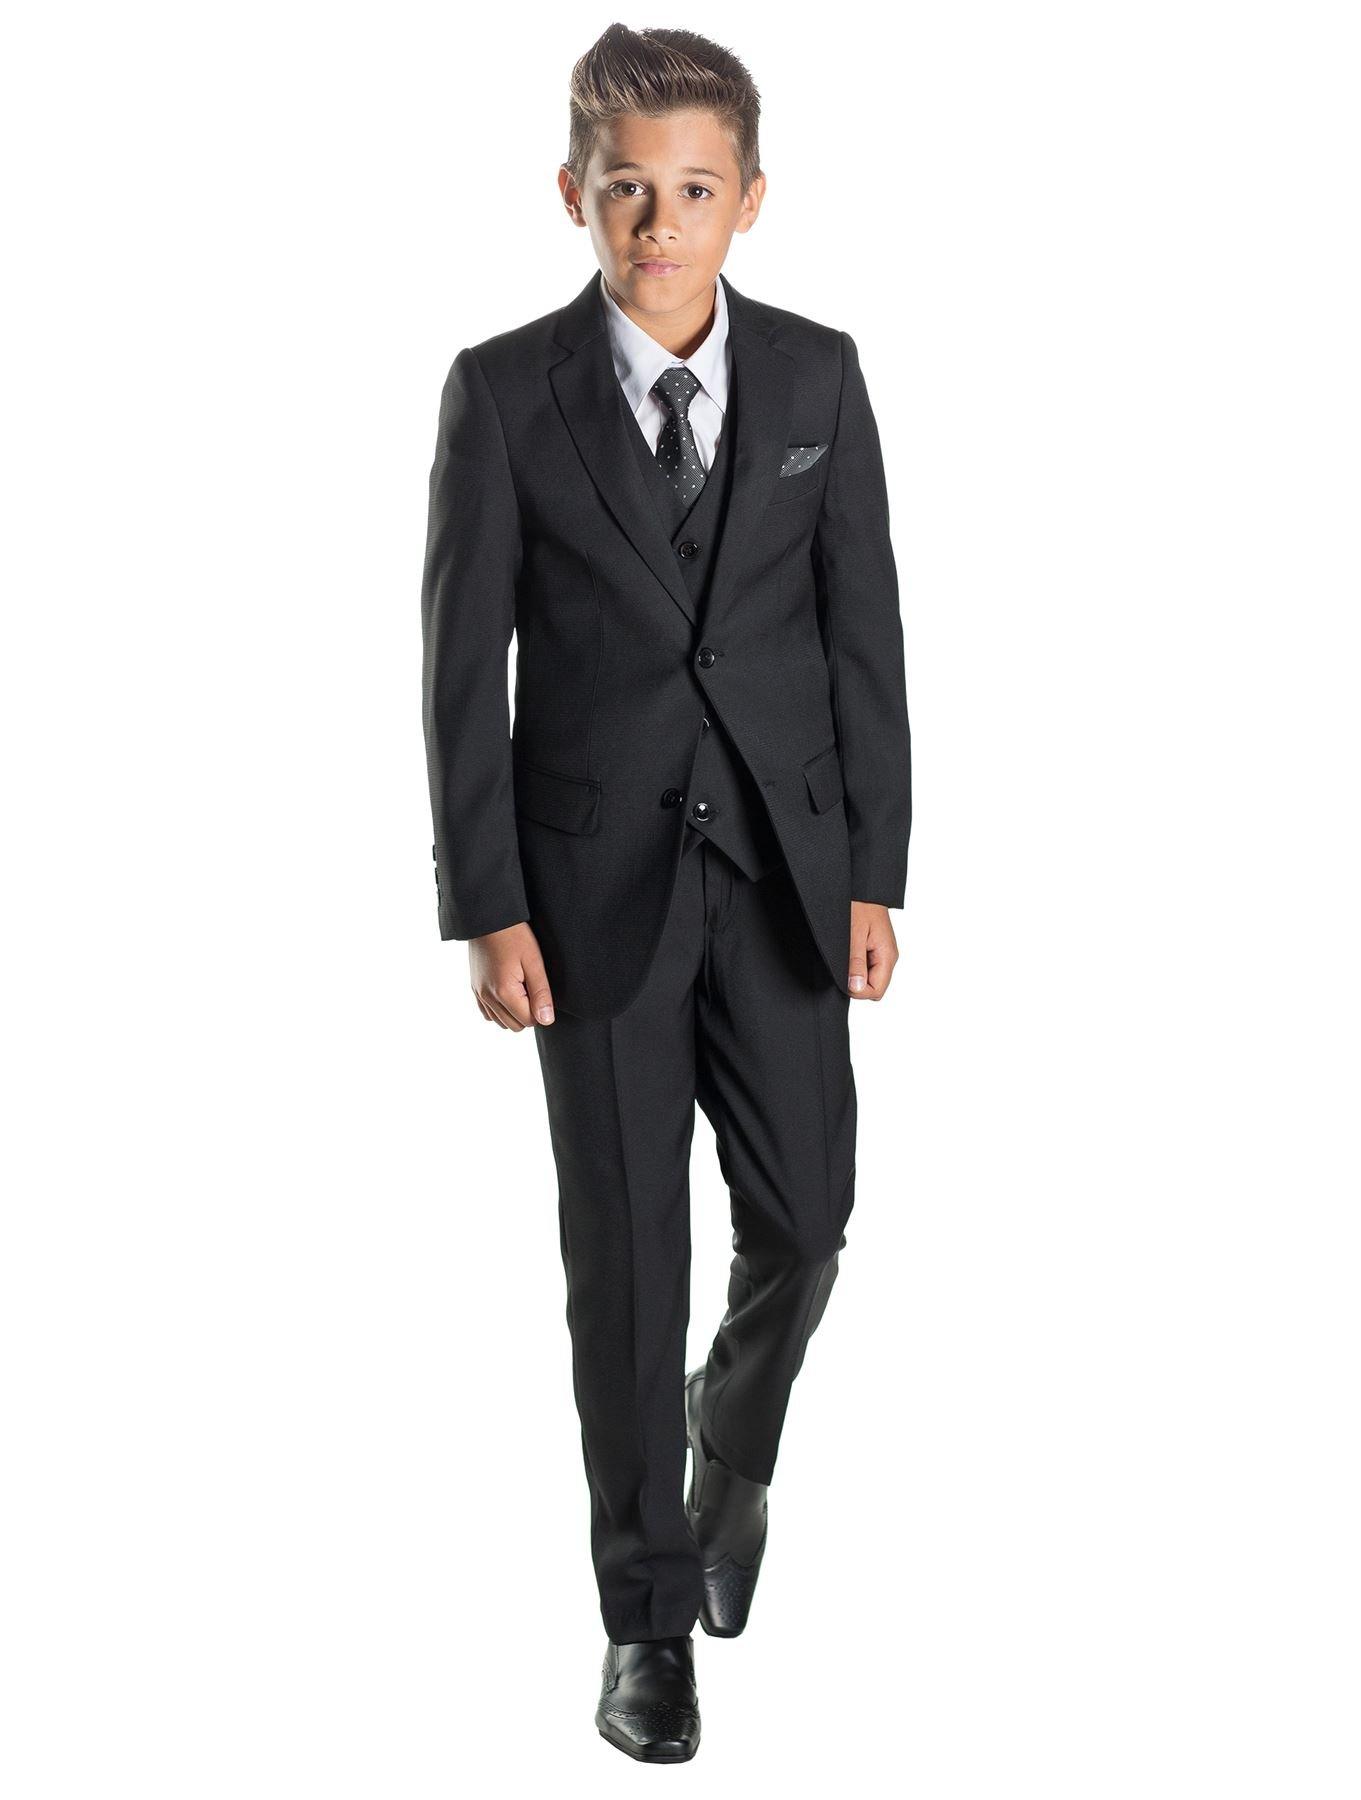 Paisley of London Boys Black Ring Bearer Suit, 12